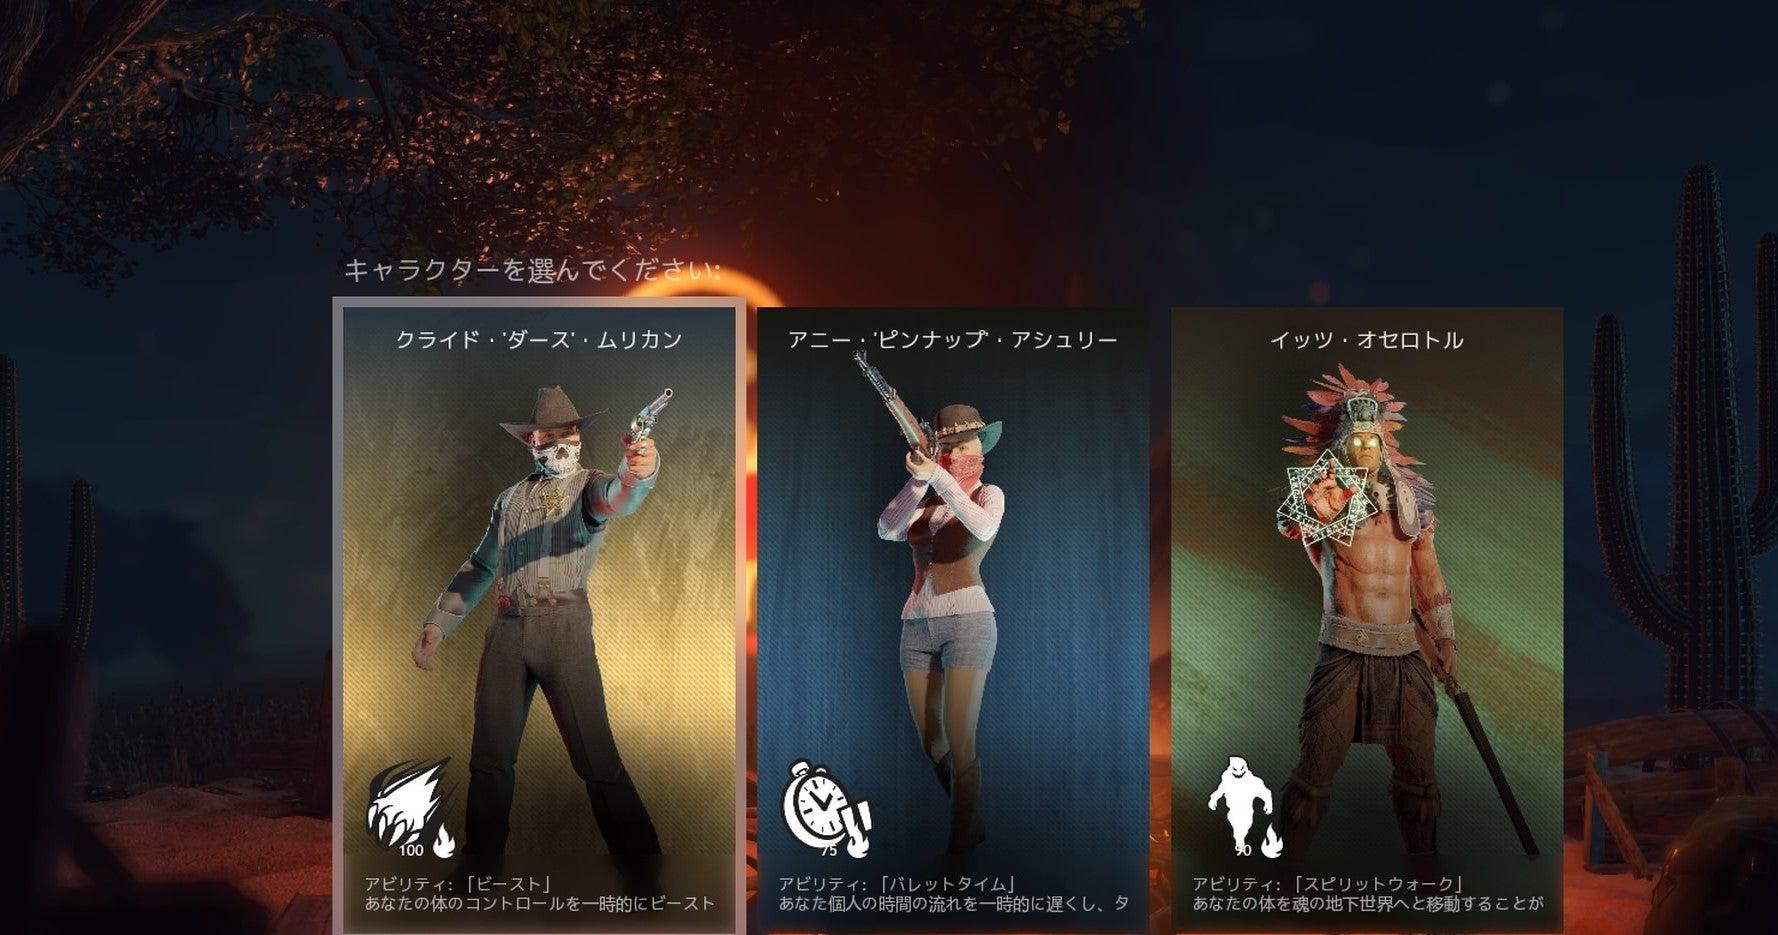 Cuisine Royale(PS4)-Part1~バカ系バトロワ。感想とかトロフィーの話   ジャンク公式ゲームブログ Powered by(笑)